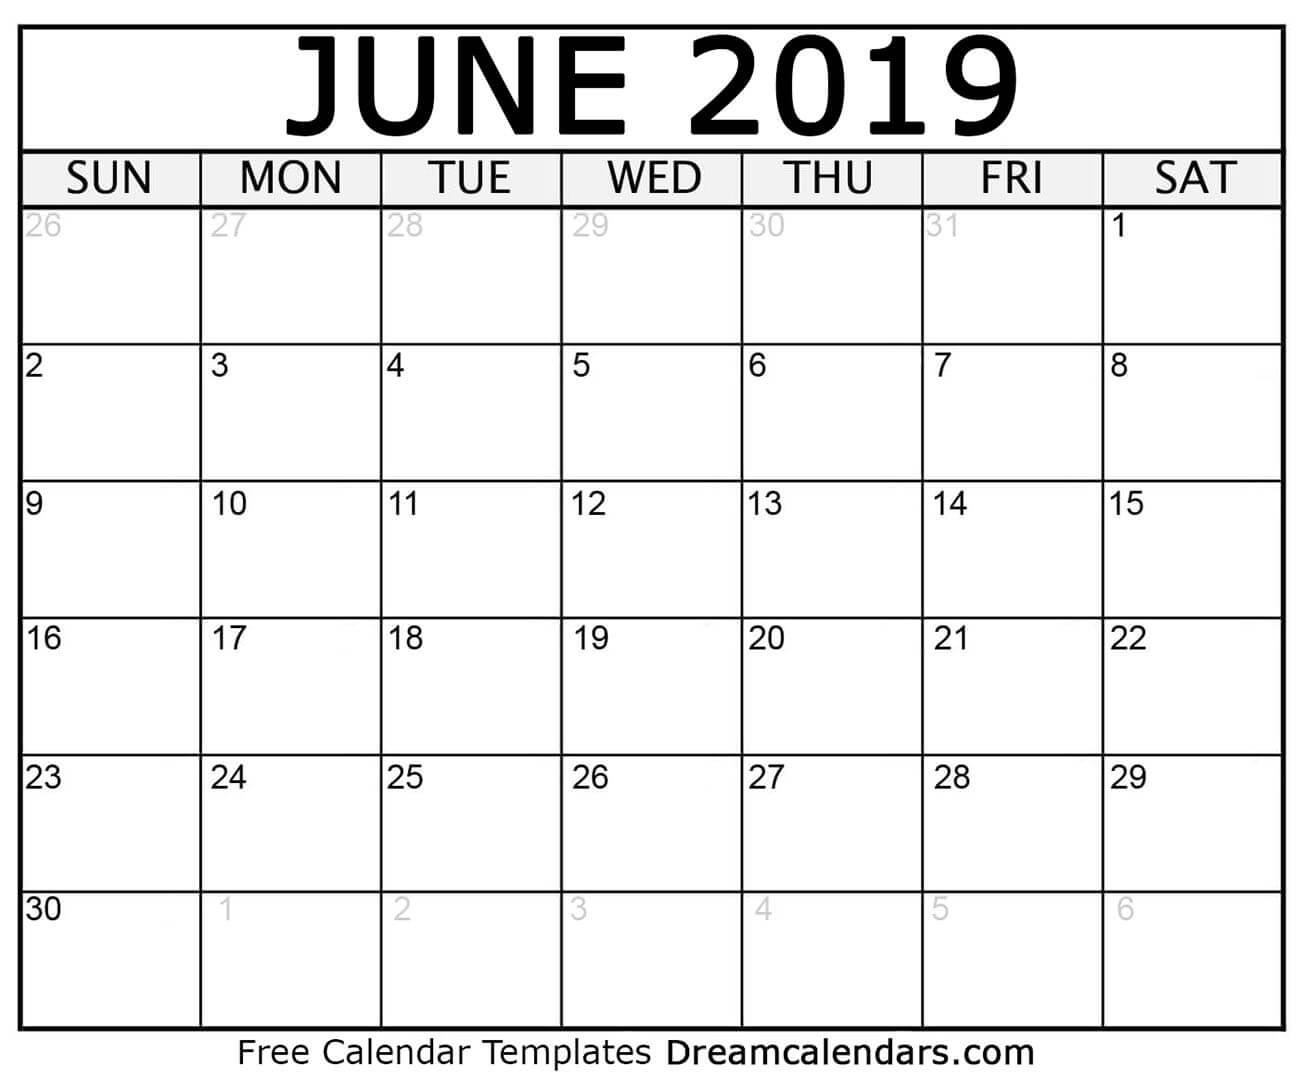 Free June 2019 Printable Calendar | Dream Calendars